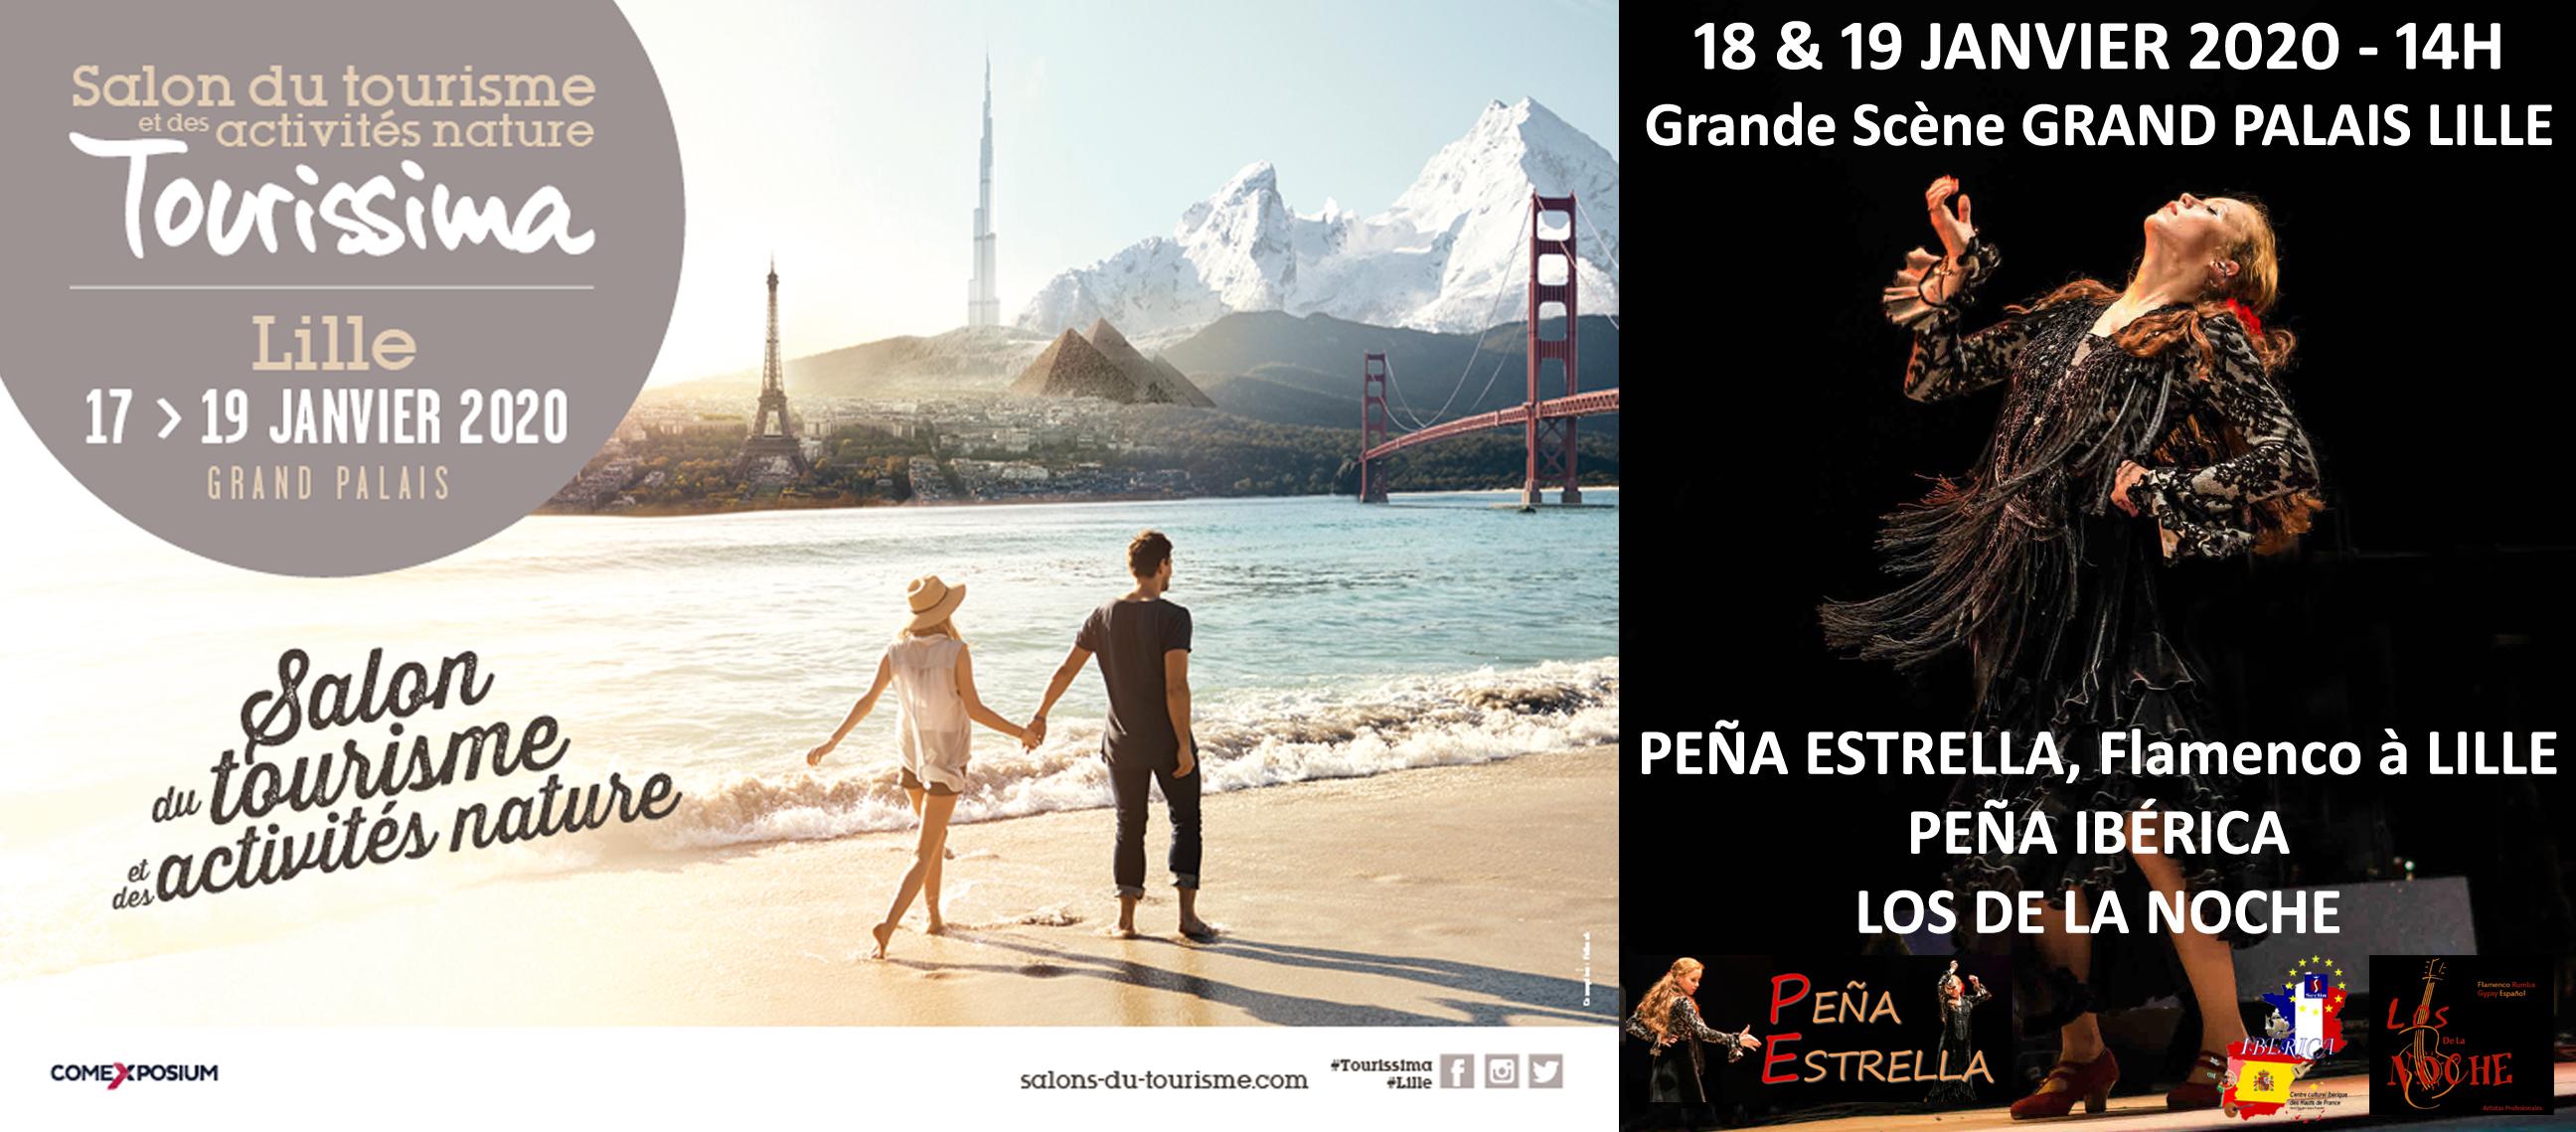 Flamenco Grand Palais Lille Tourissima Estrella La Peli de Linares 18&19 Janvier à 14h